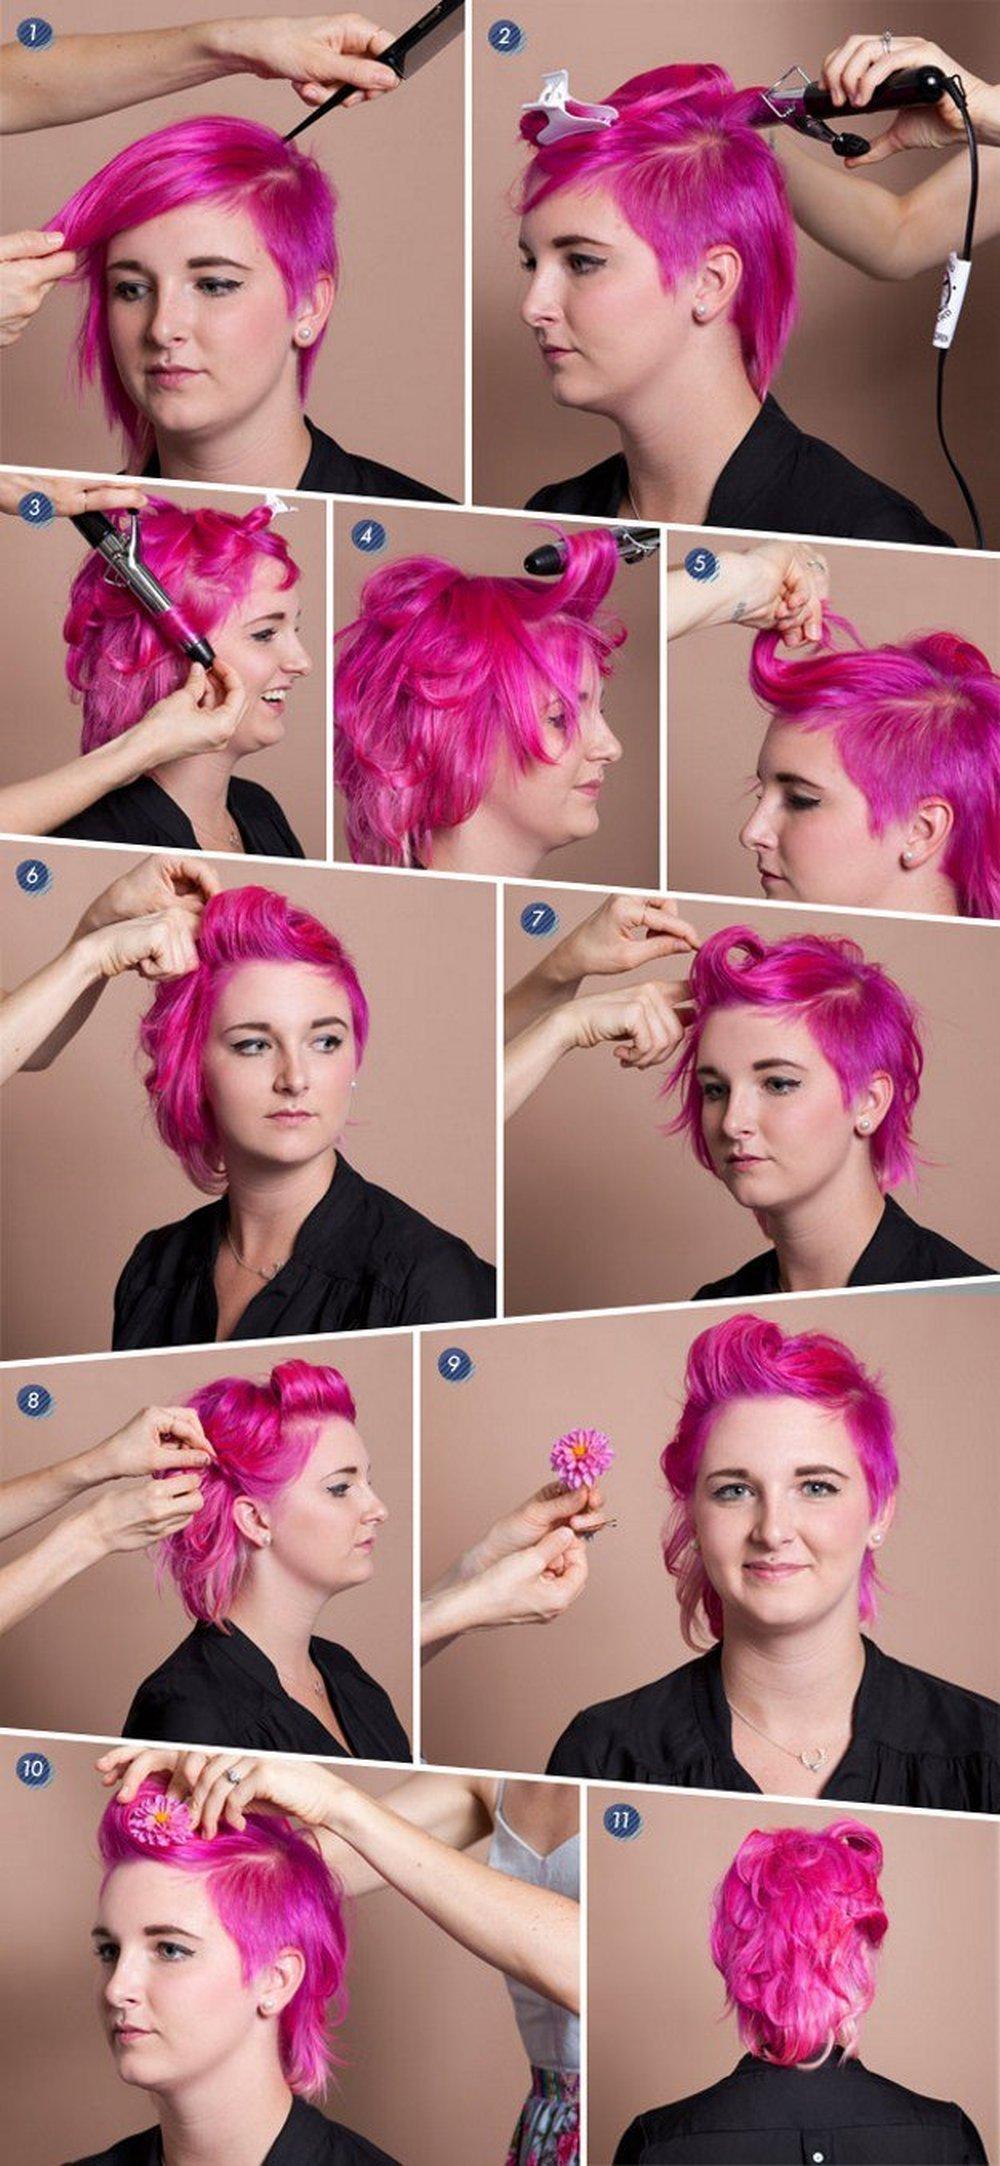 причёски для коротких волос фото 21